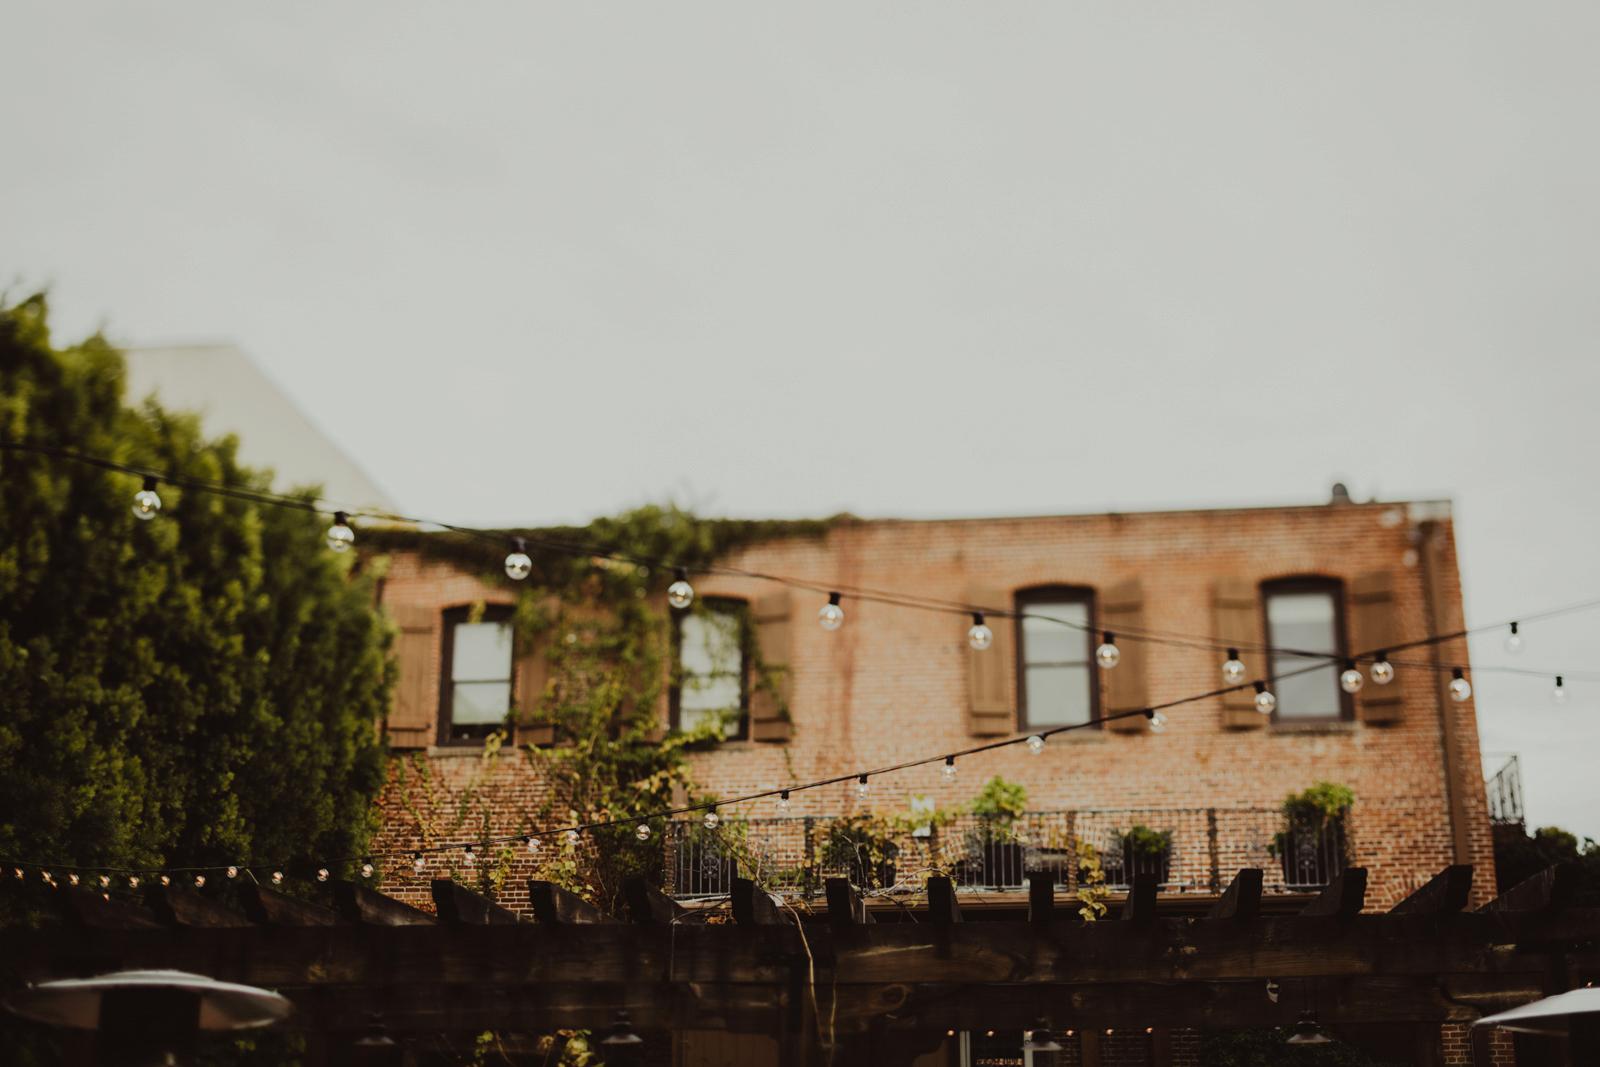 PaulSimonPhotography-JessicaJosh-SanJuanCapistranoWedding-87.jpg